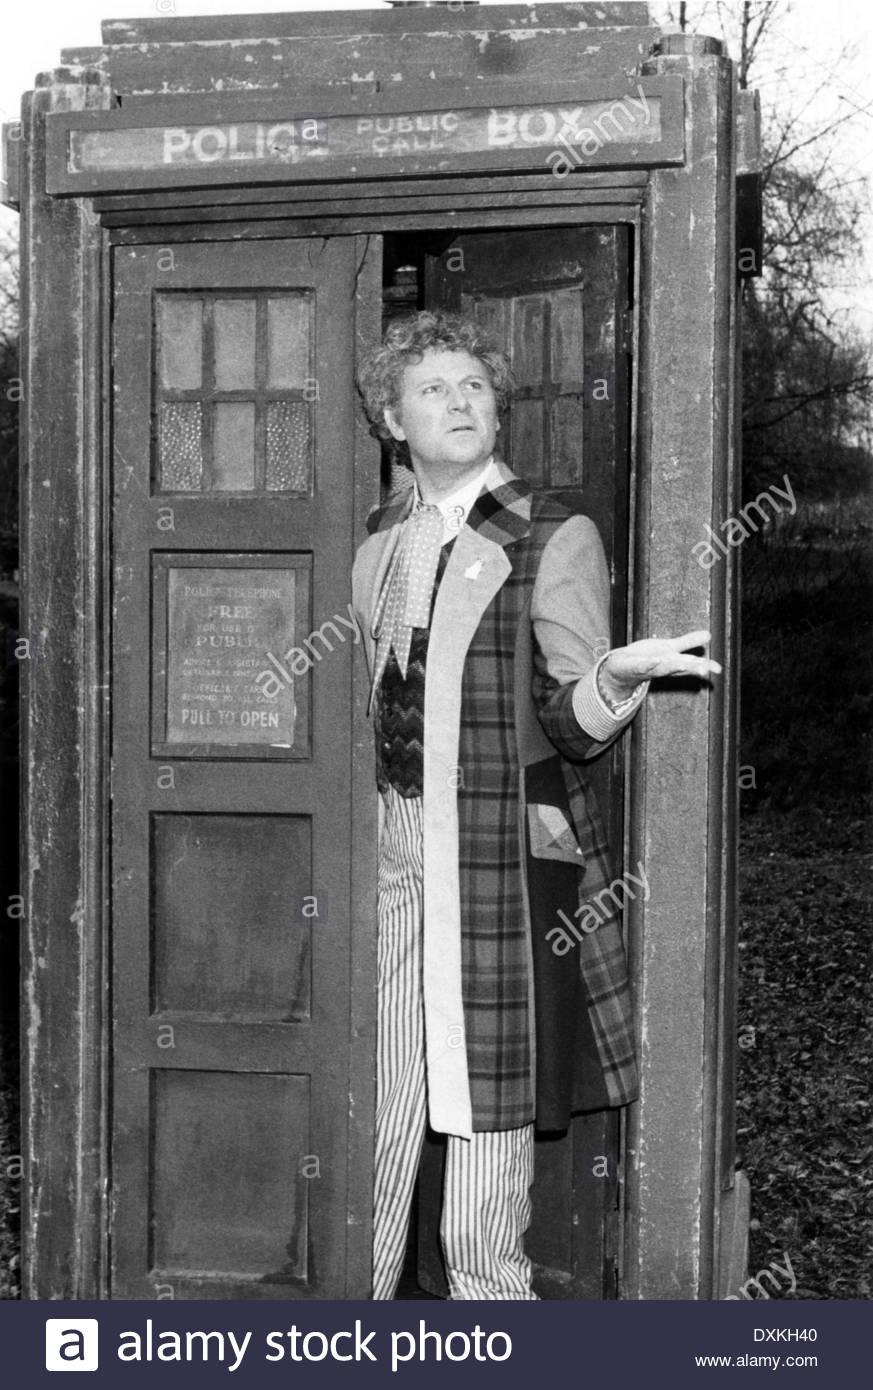 doctor-who-DXKH40.jpg